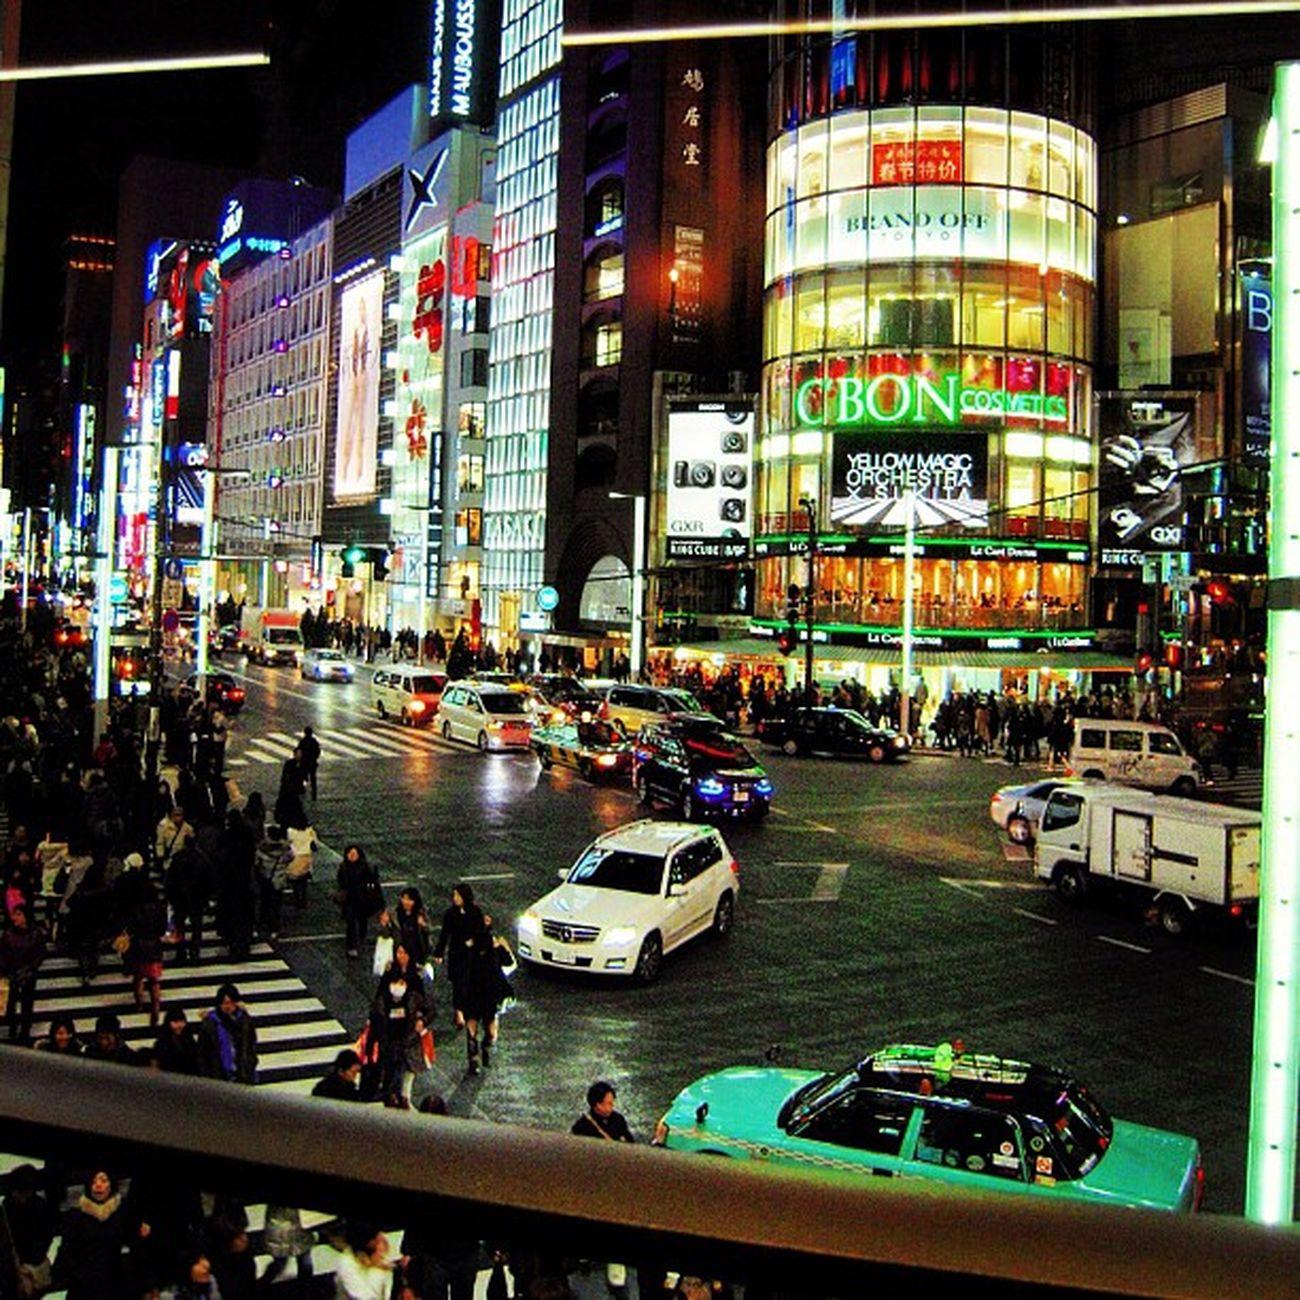 View from Laduree patisserie in Mitsukoshi Ginza Japan 2011